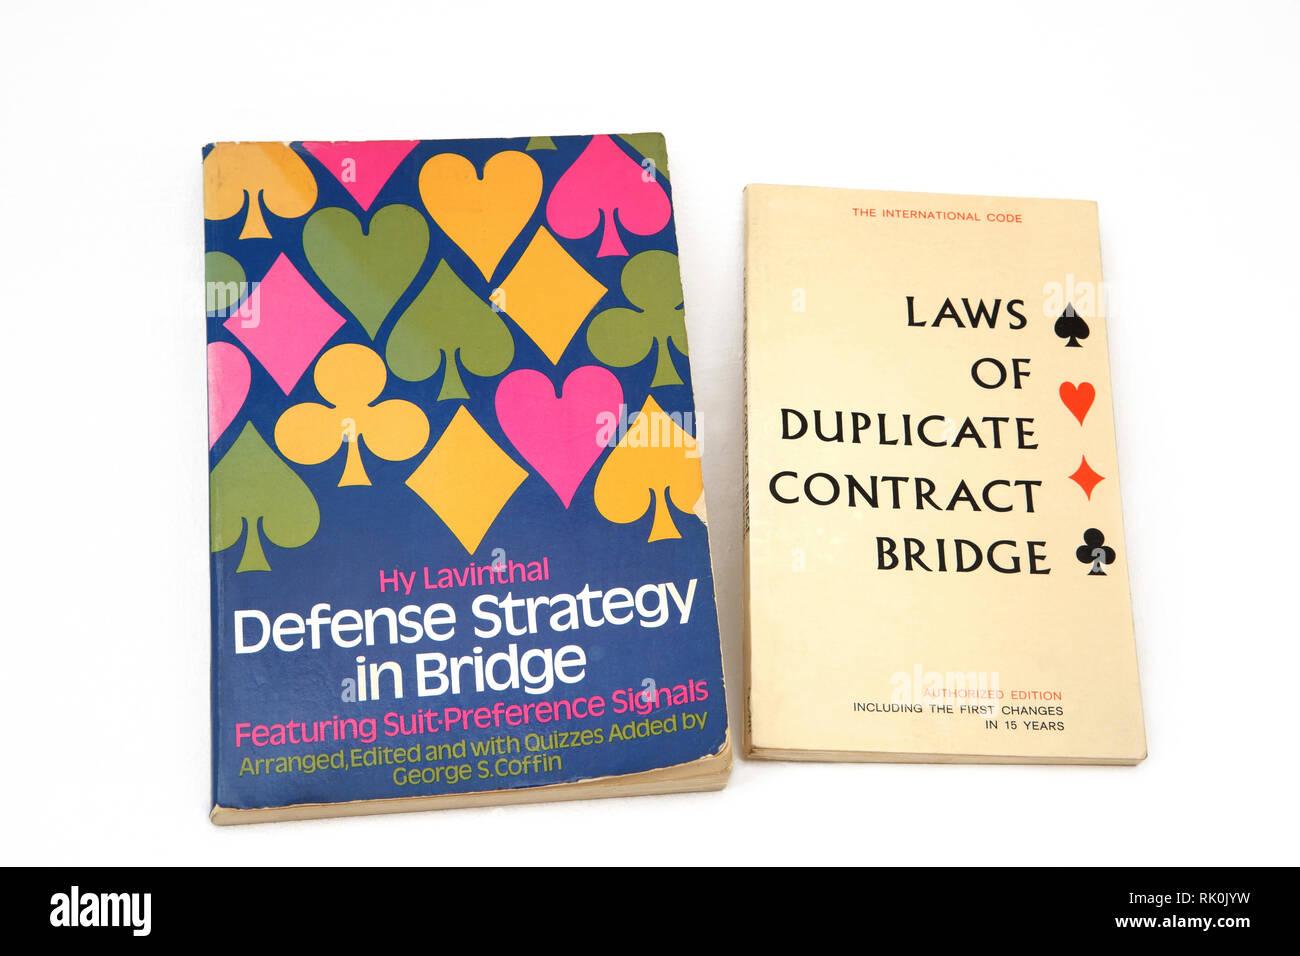 Books on Bridge - Defense Strategy in Bridge and Laws of Duplicate Contract Bridge - Stock Image